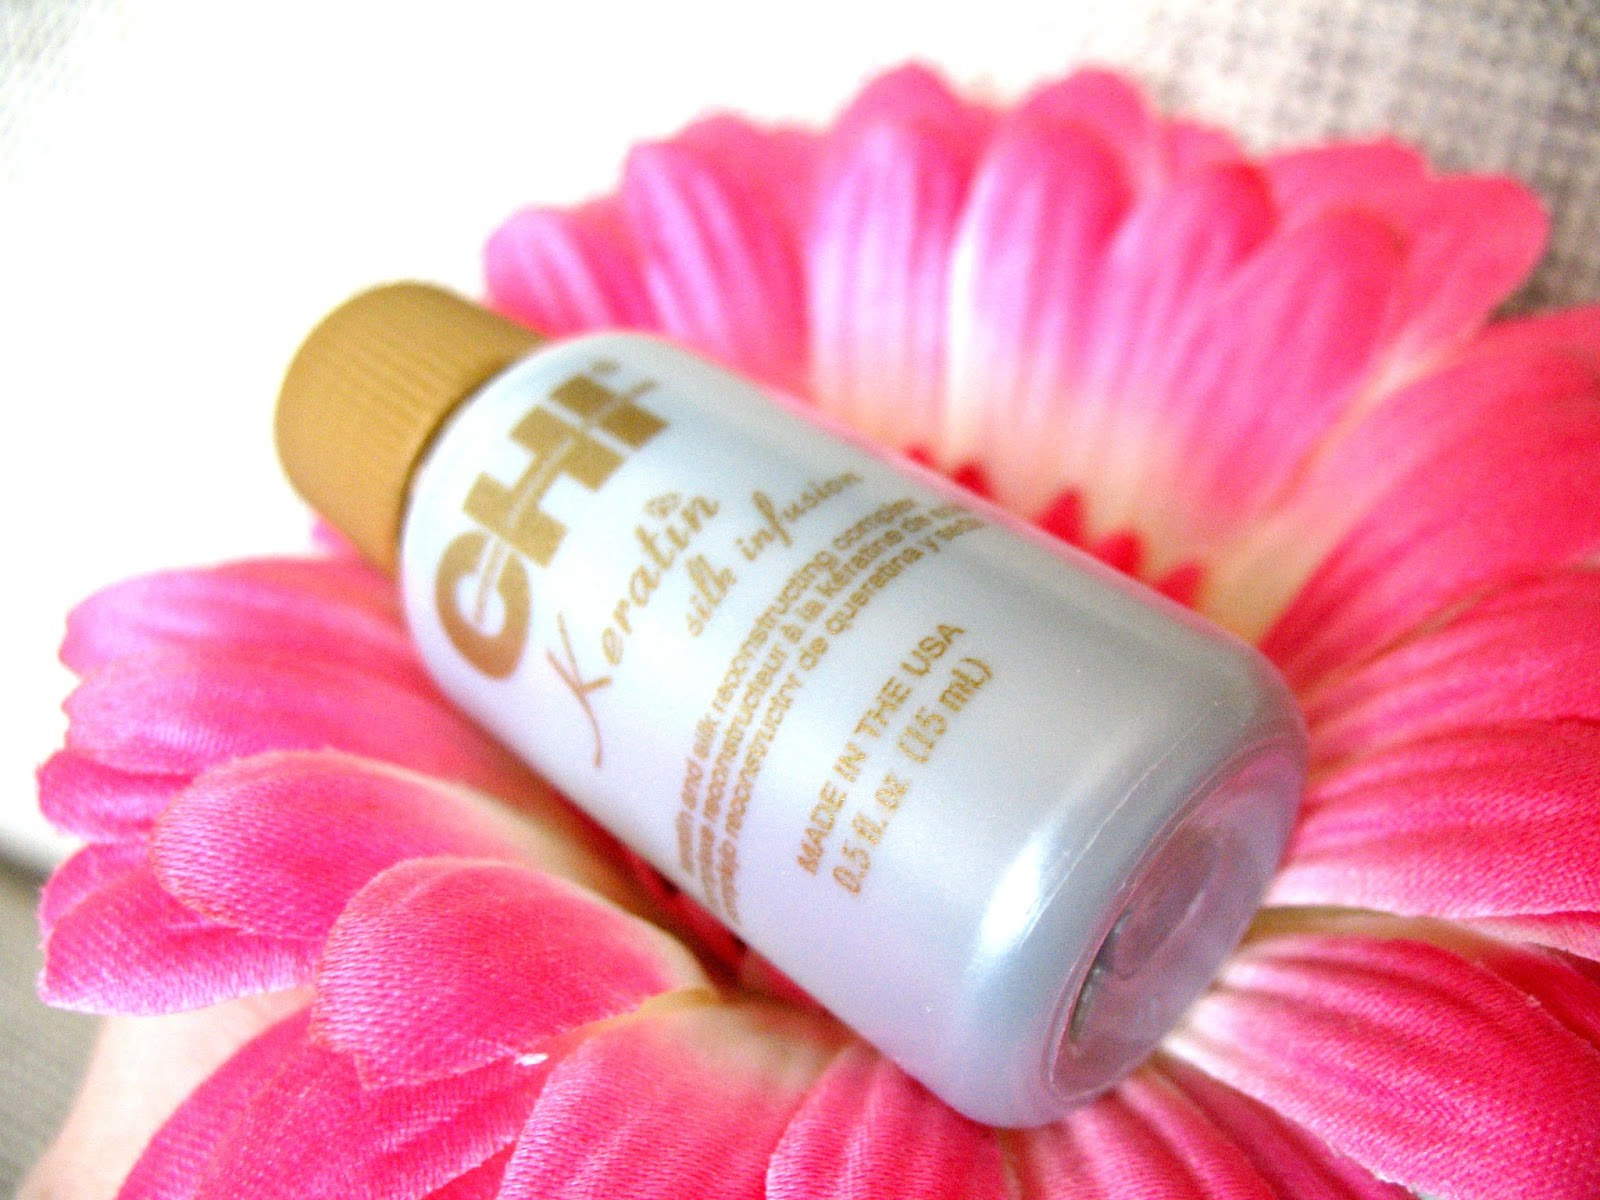 CHI_keratin_silk_infusion_review_beauty_blog_04